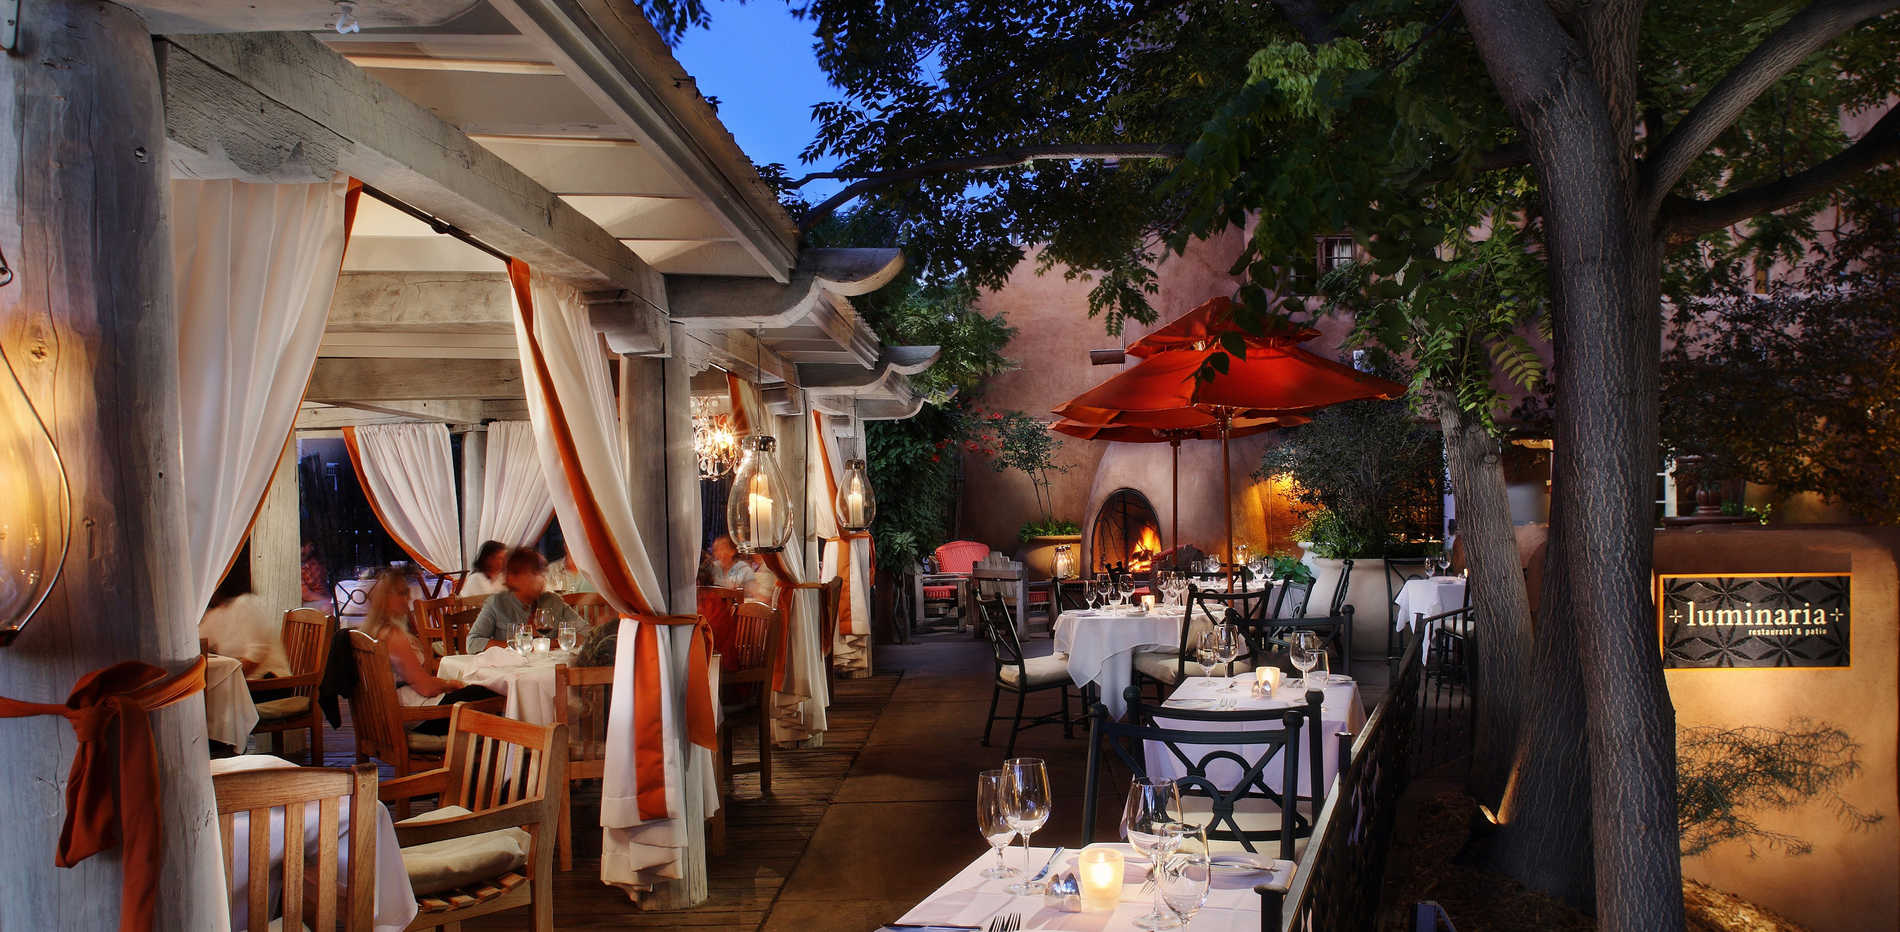 Top-Loretto-Santa-Fe-Hotel-Luminaria-Patio1.jpg